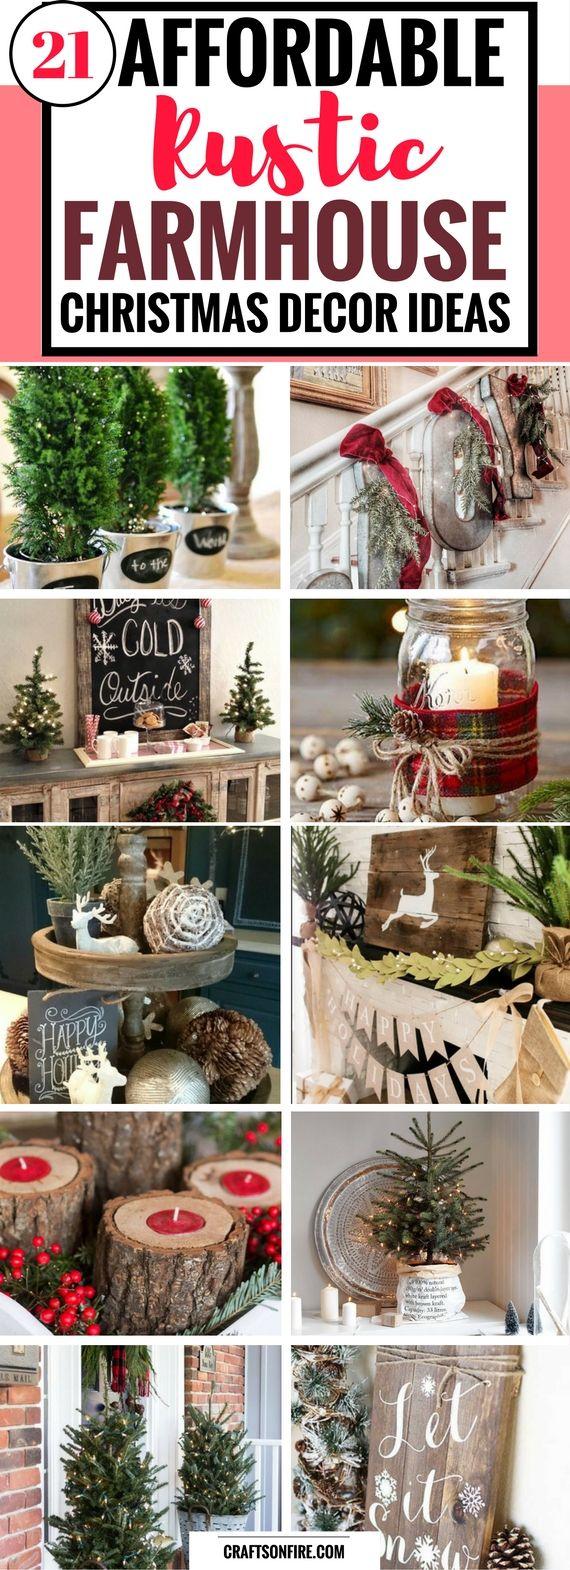 21 Affordable Rustic Farmhouse Christmas Decor Ideas Craftsonfire Farmhouse Christmas Decor Christmas Decorations Christmas Diy